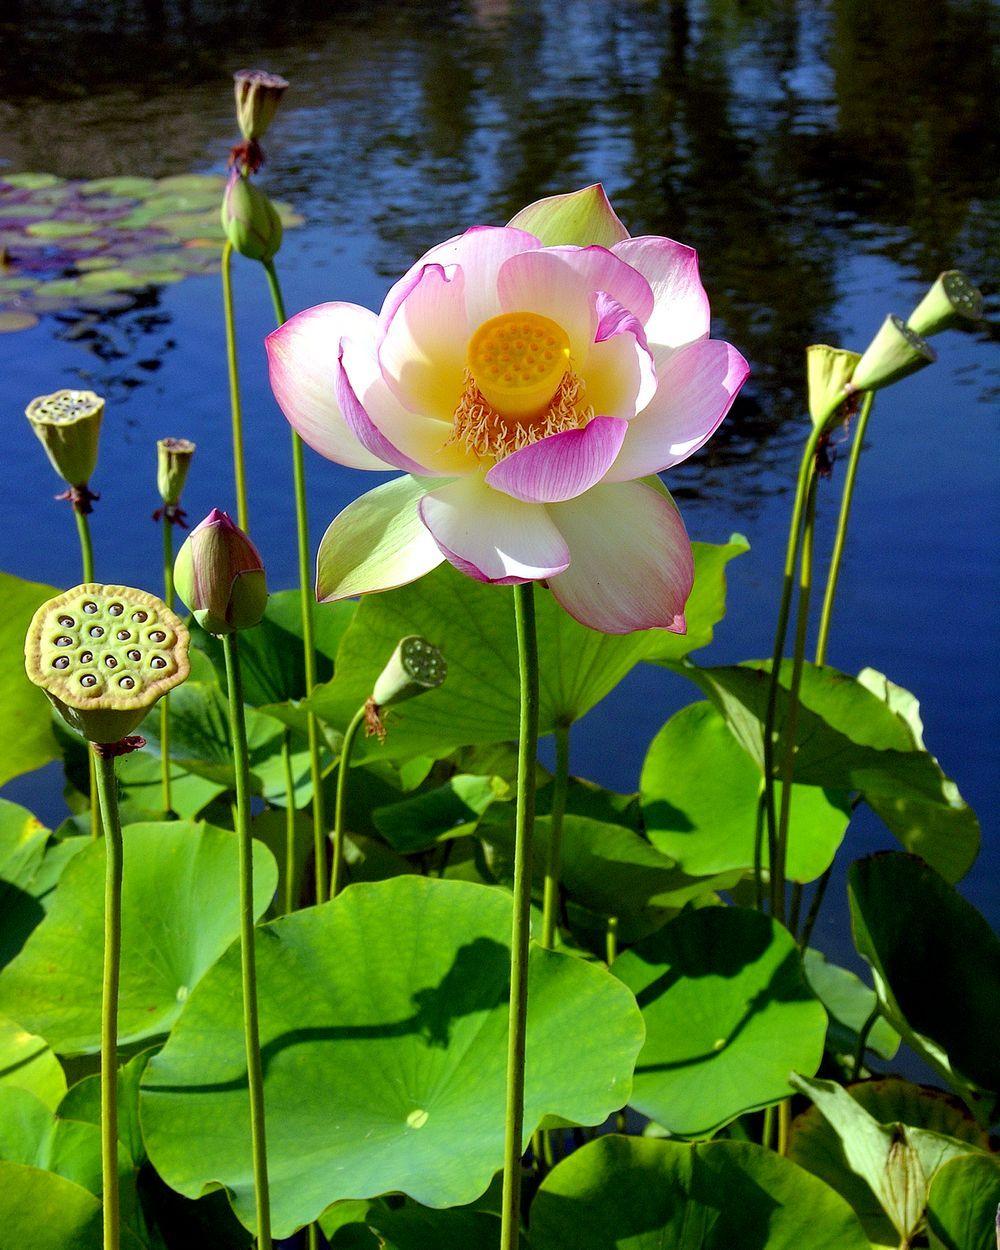 Egyptian Lotus Blossom Balboa Park San Diego California For